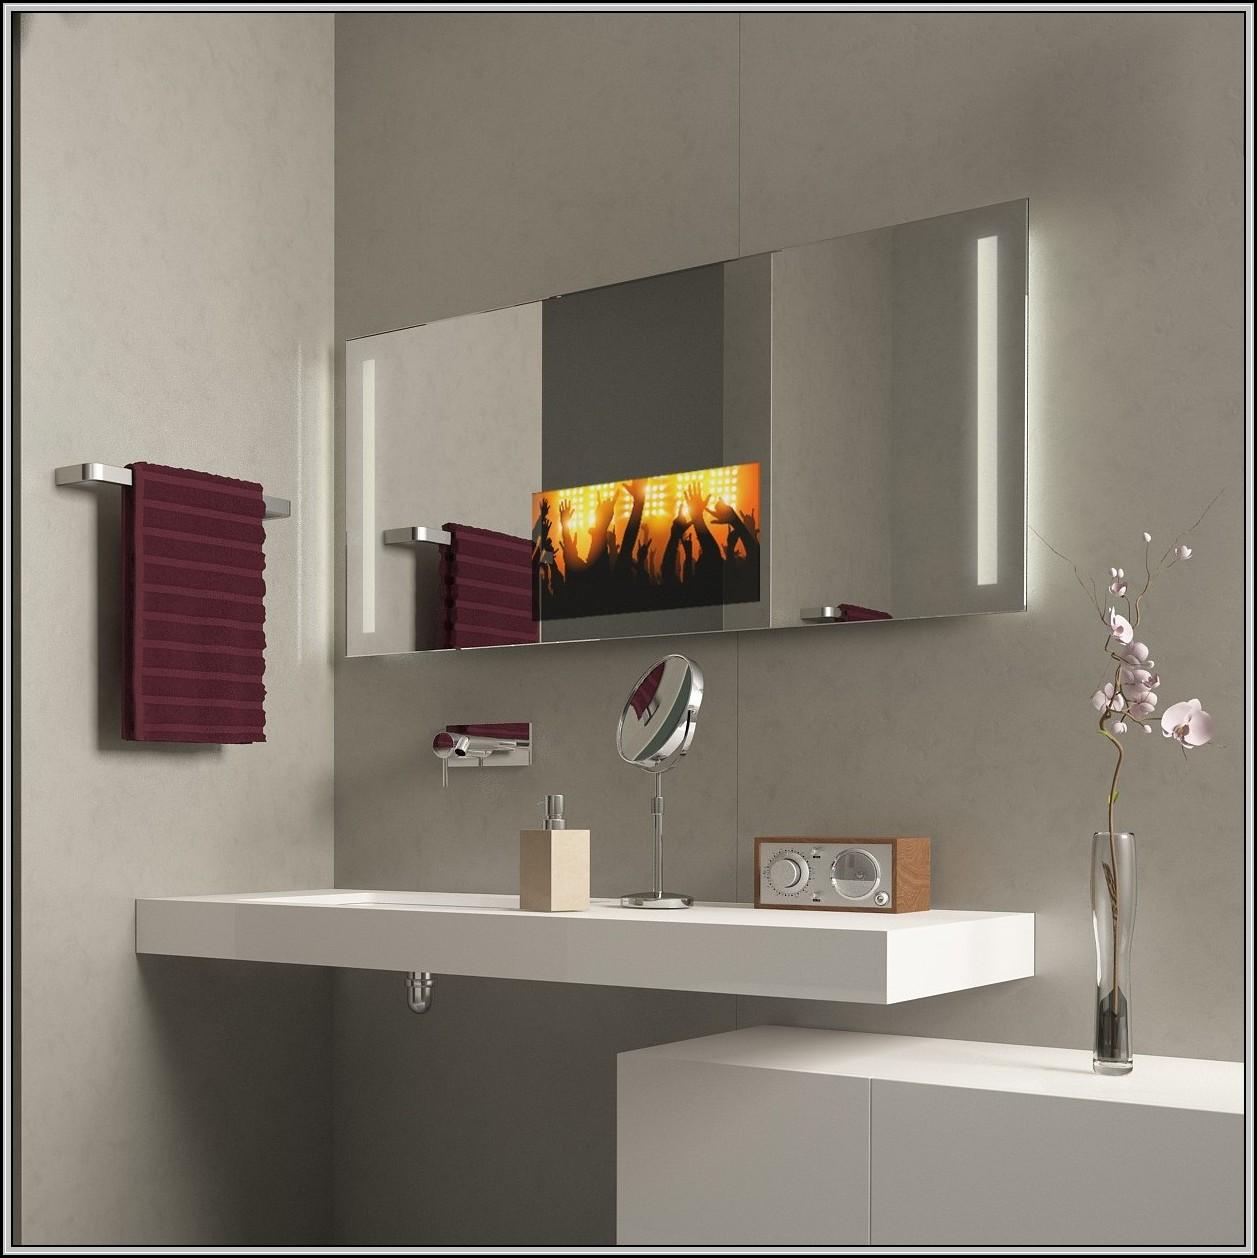 spiegelschrank bad mit beleuchtung obi beleuchthung house und dekor galerie gekgkxdkxo. Black Bedroom Furniture Sets. Home Design Ideas